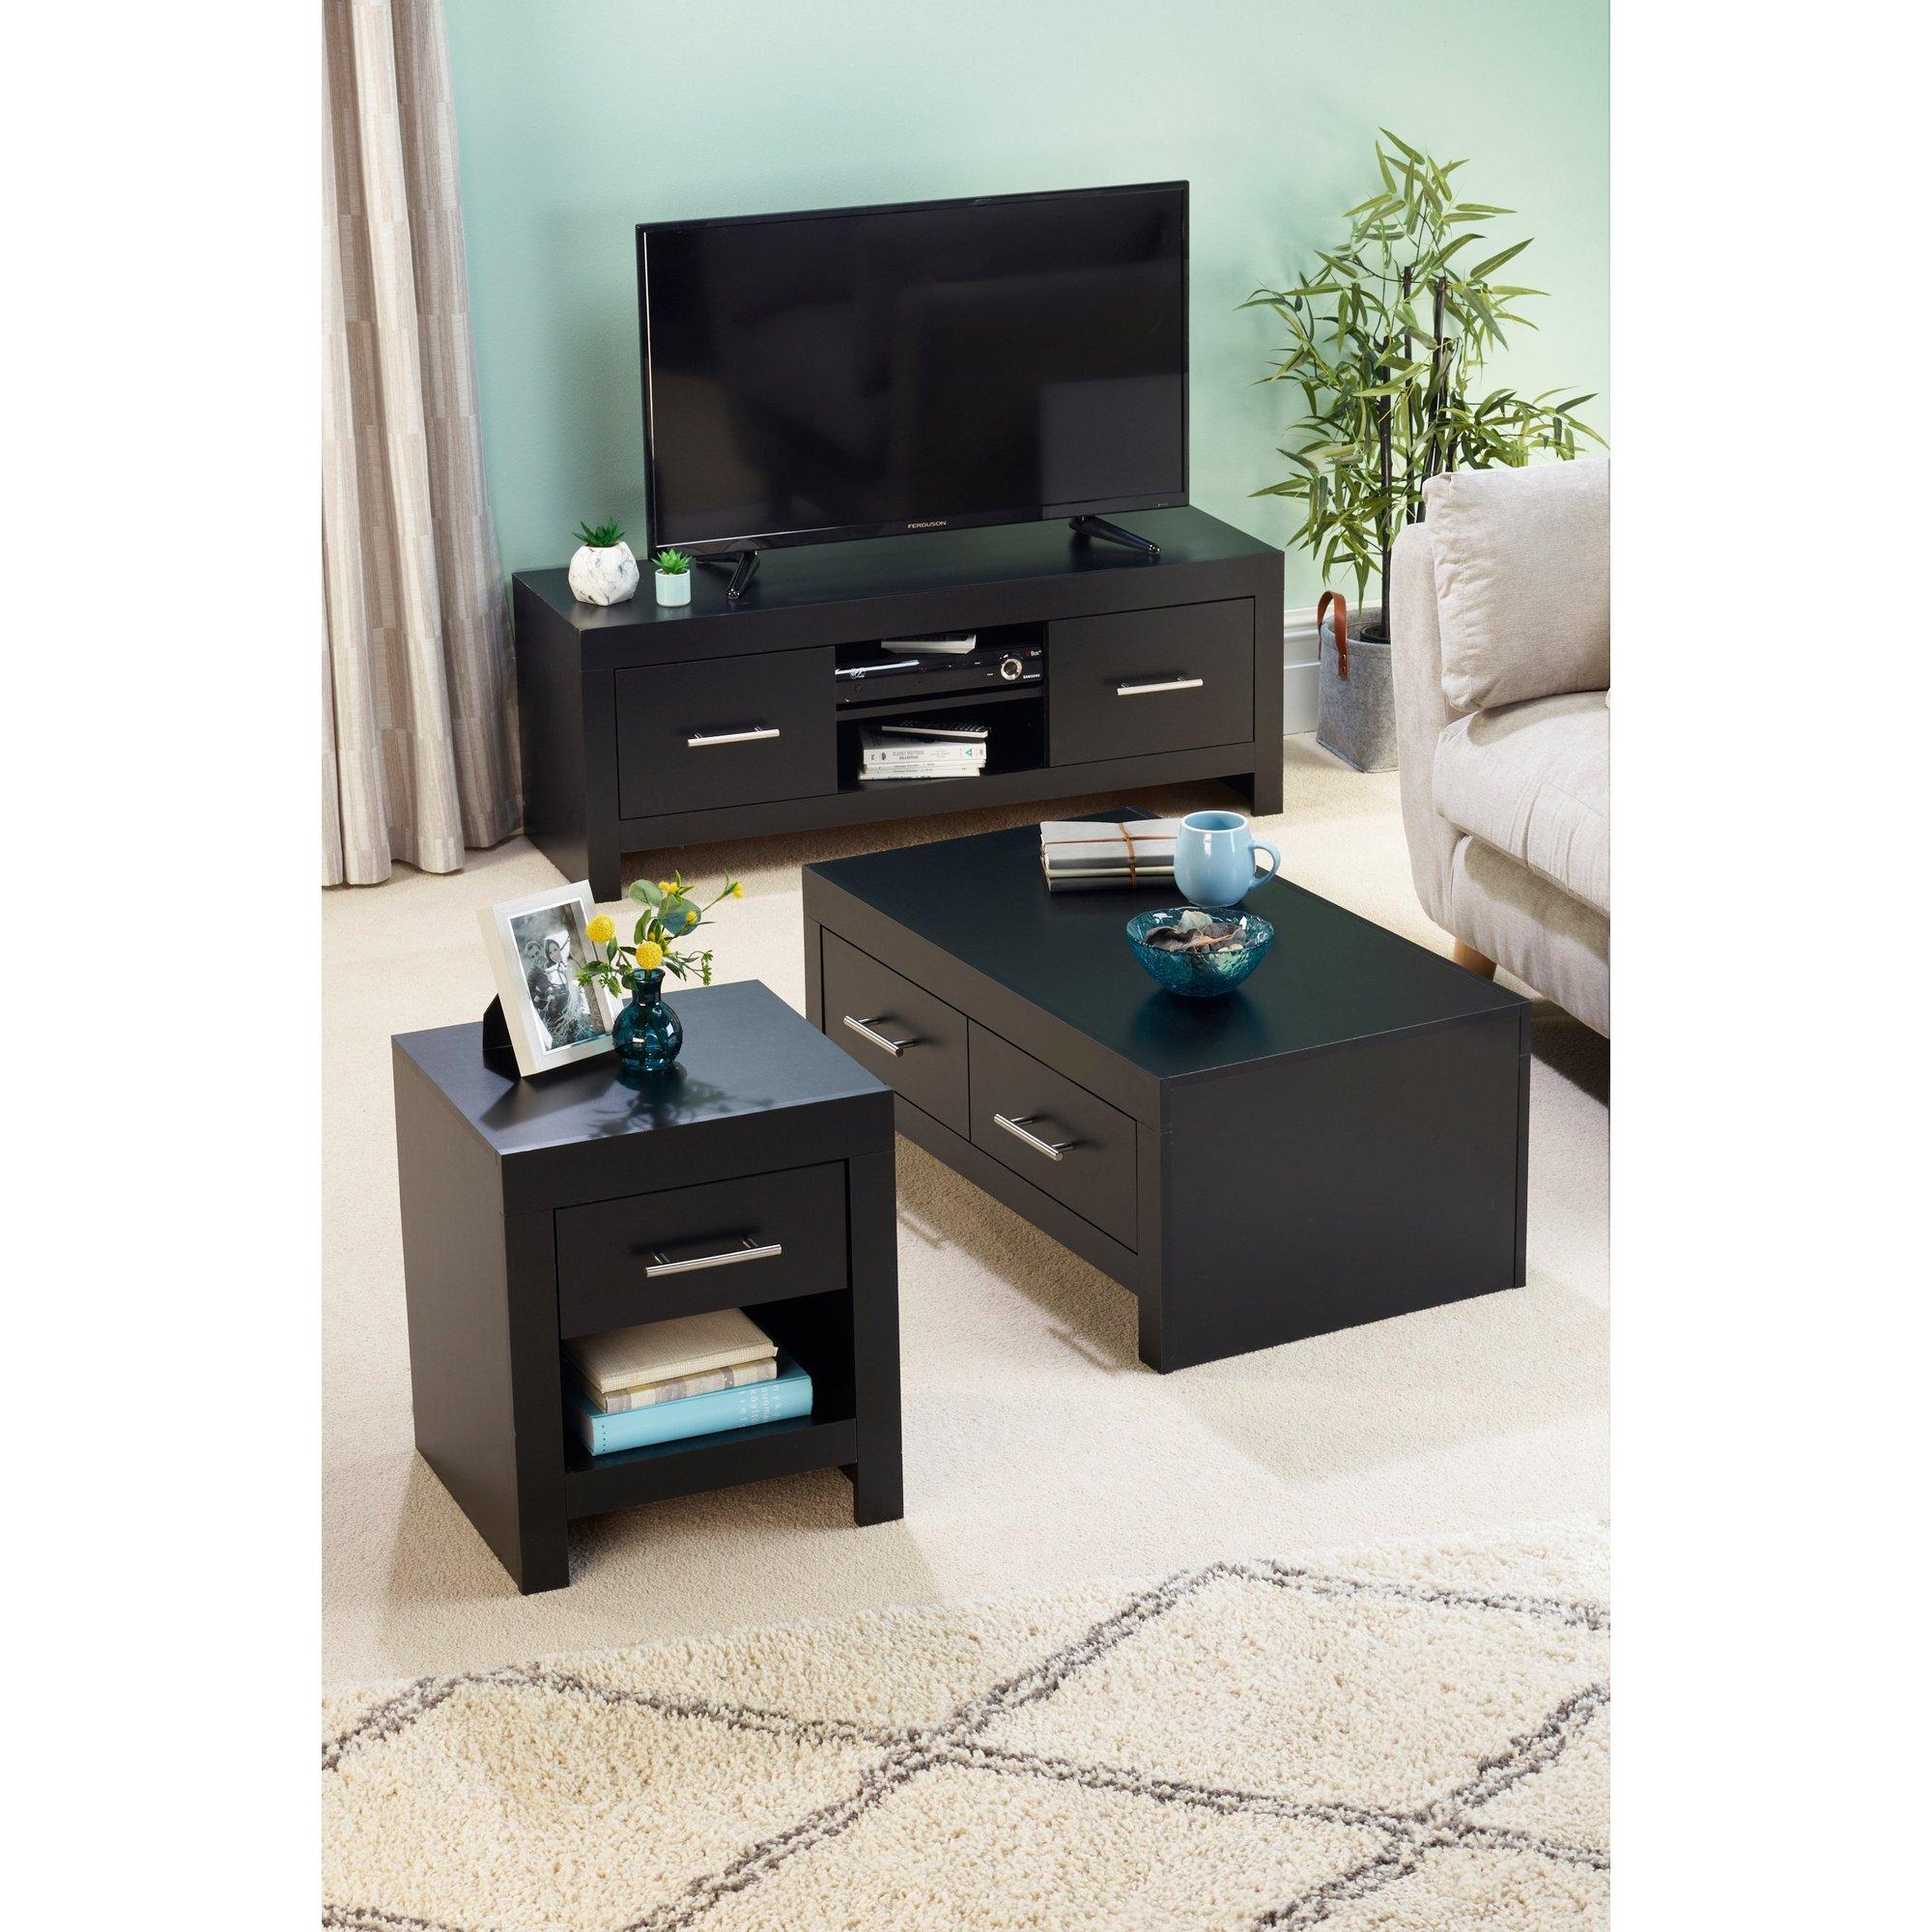 Image of Bicester 3-Piece Furniture Set